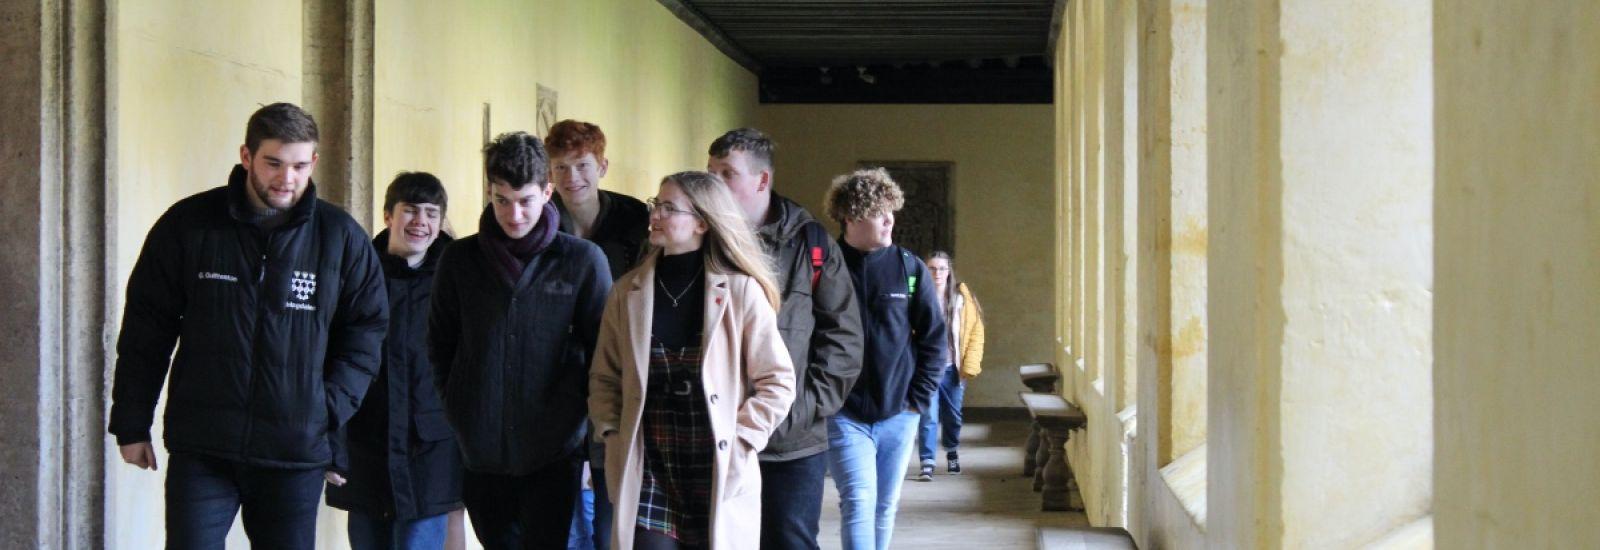 Student ambassador showing prospective students around Magdalen College.